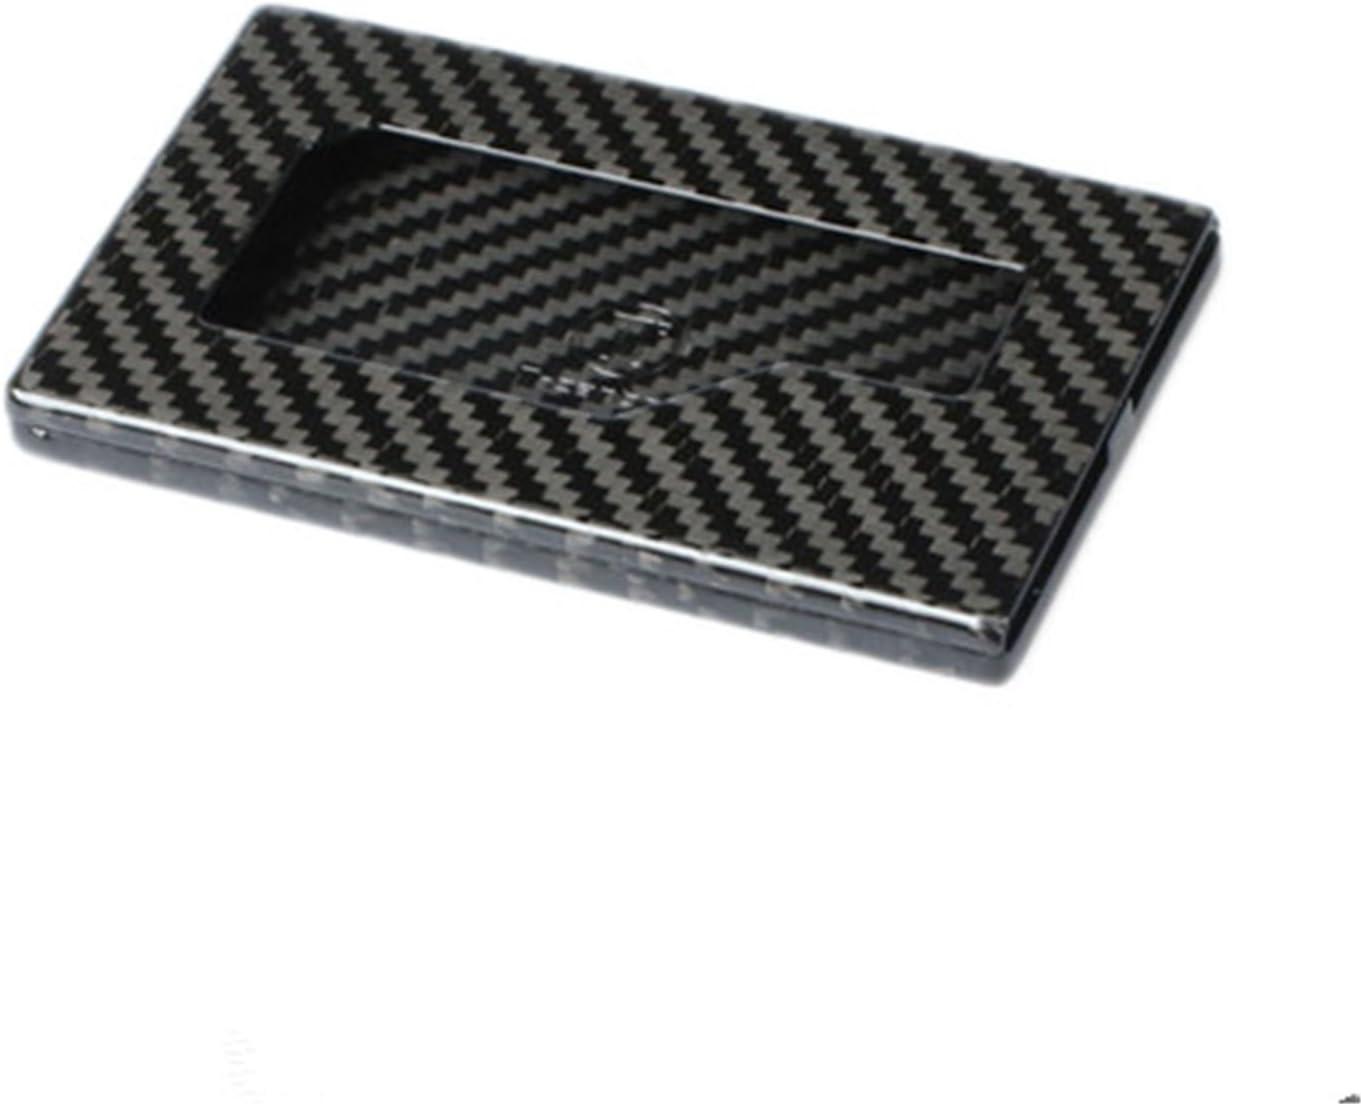 Real Genuine Carbon Fiber Business Bargain sale Card Professional 40% OFF Cheap Sale Holder Bus